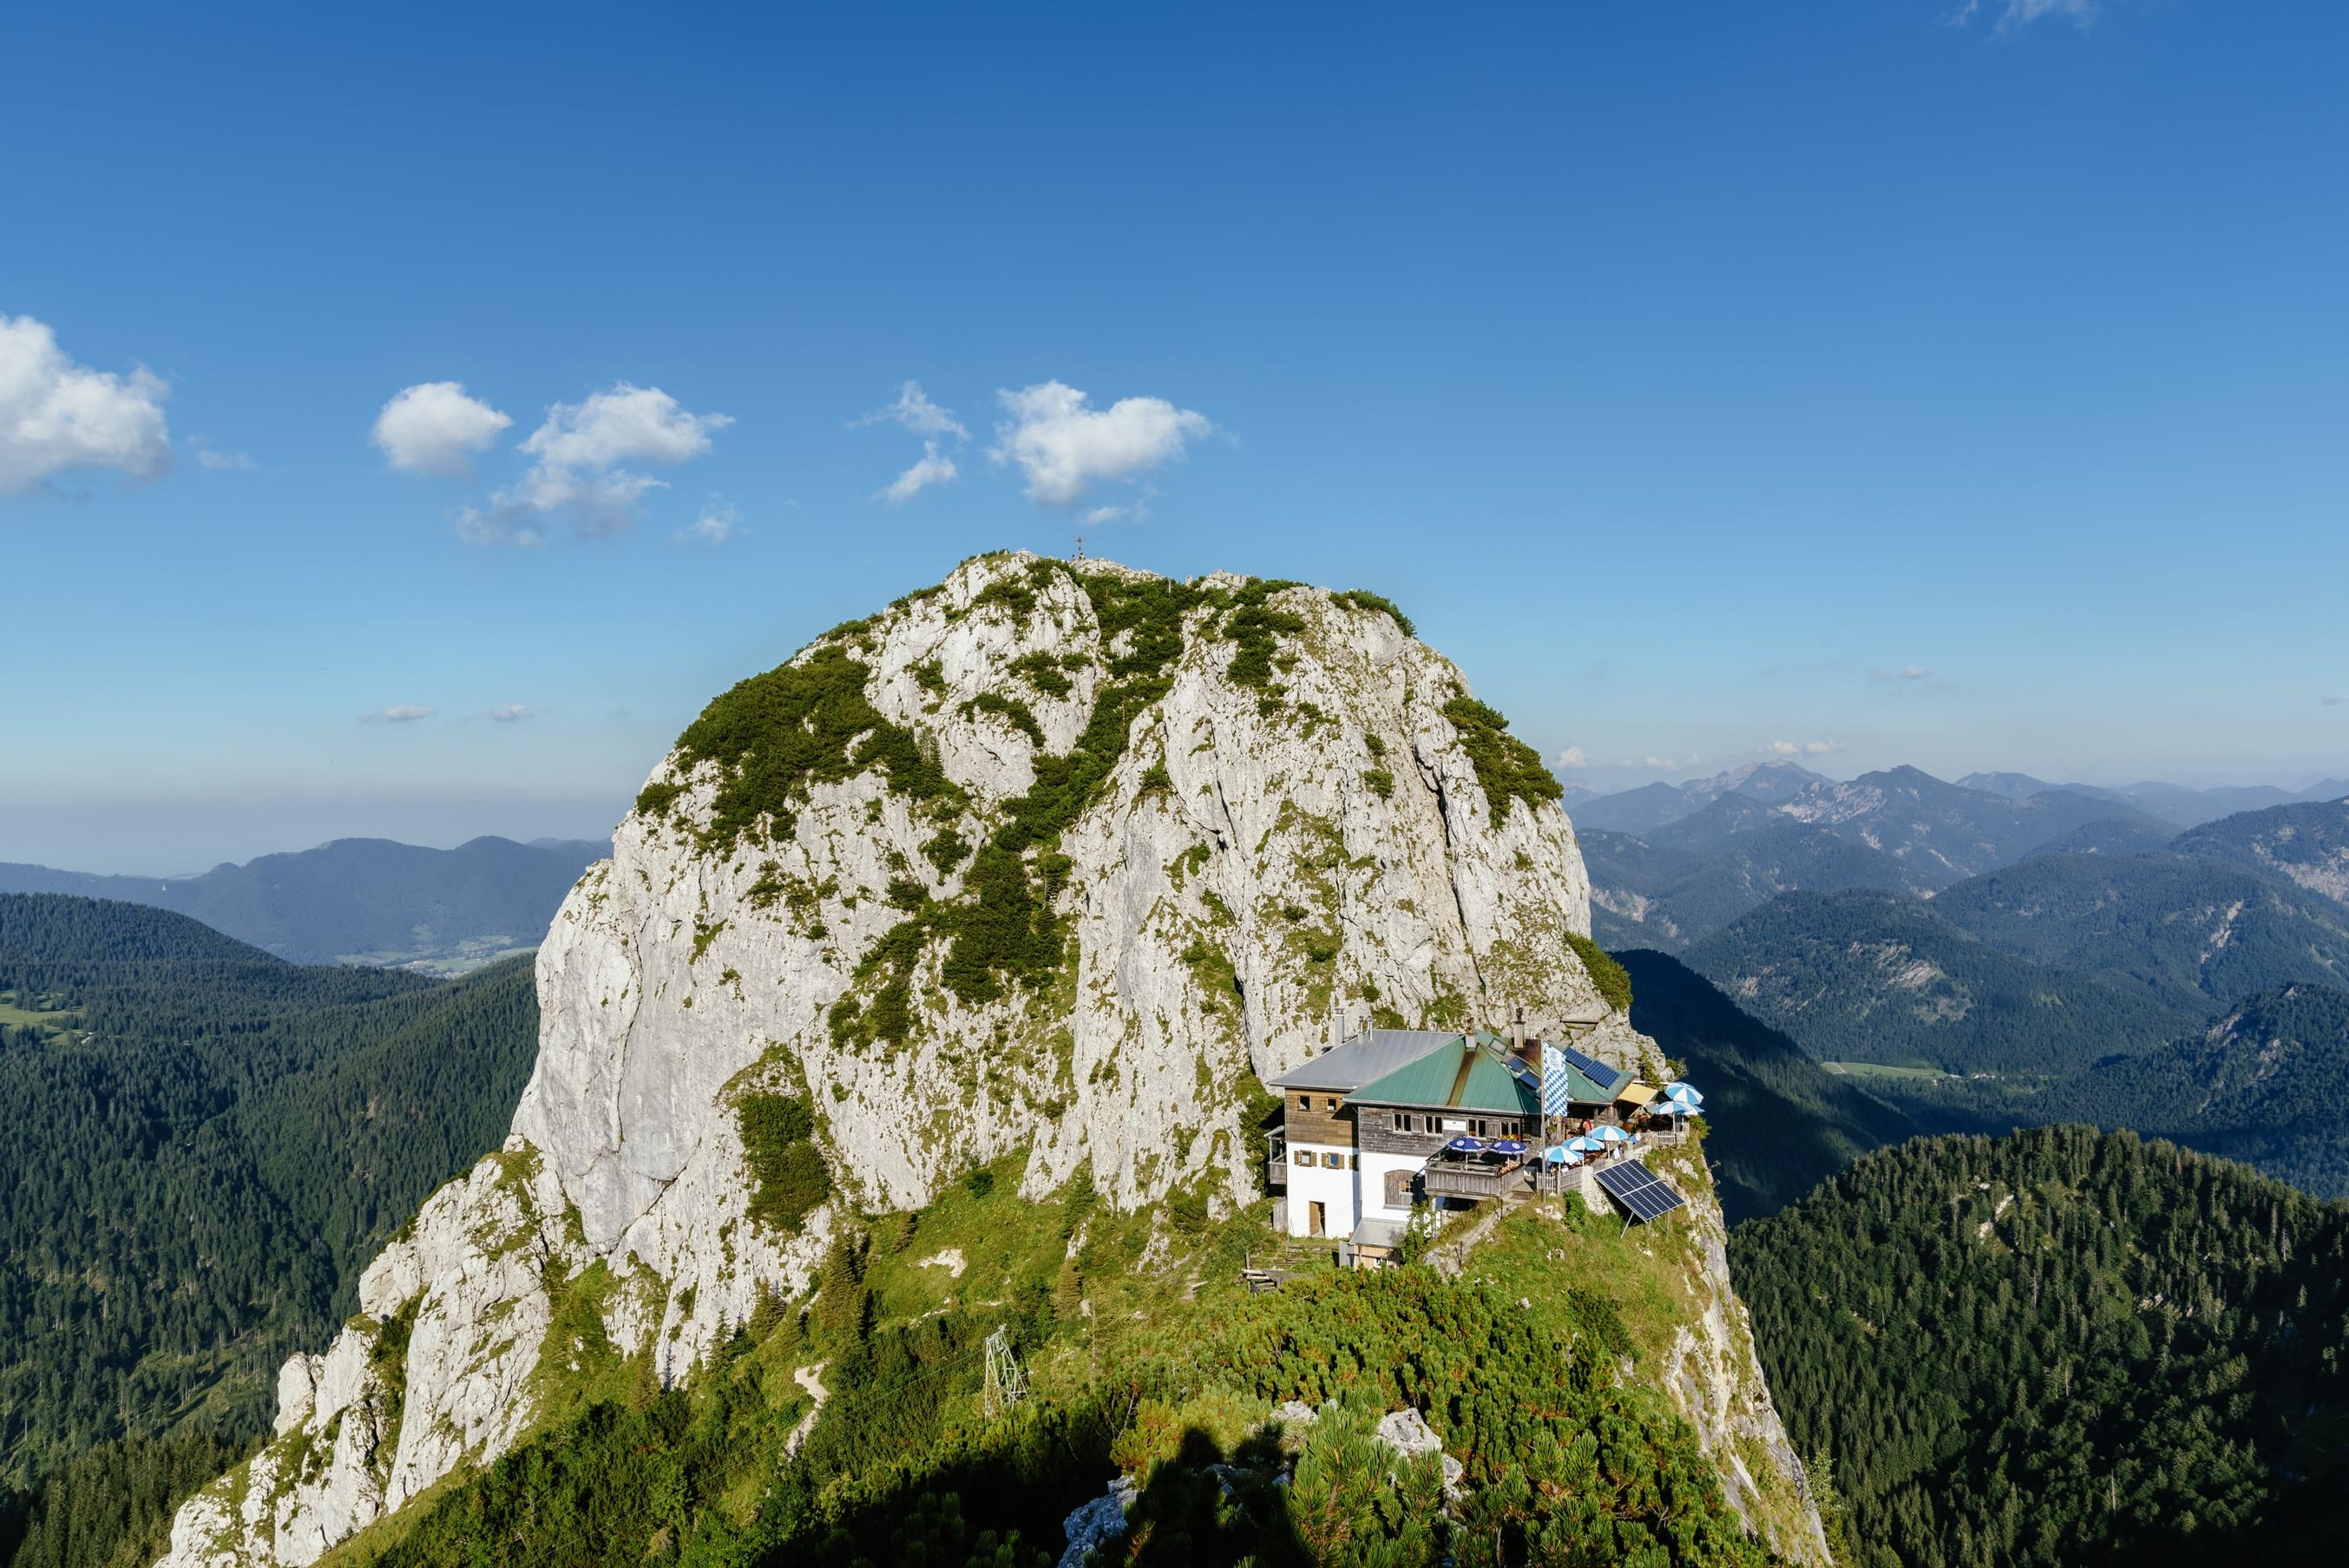 Klettersteig Tegernsee : Tegernseer hütte infos touren bergwelten